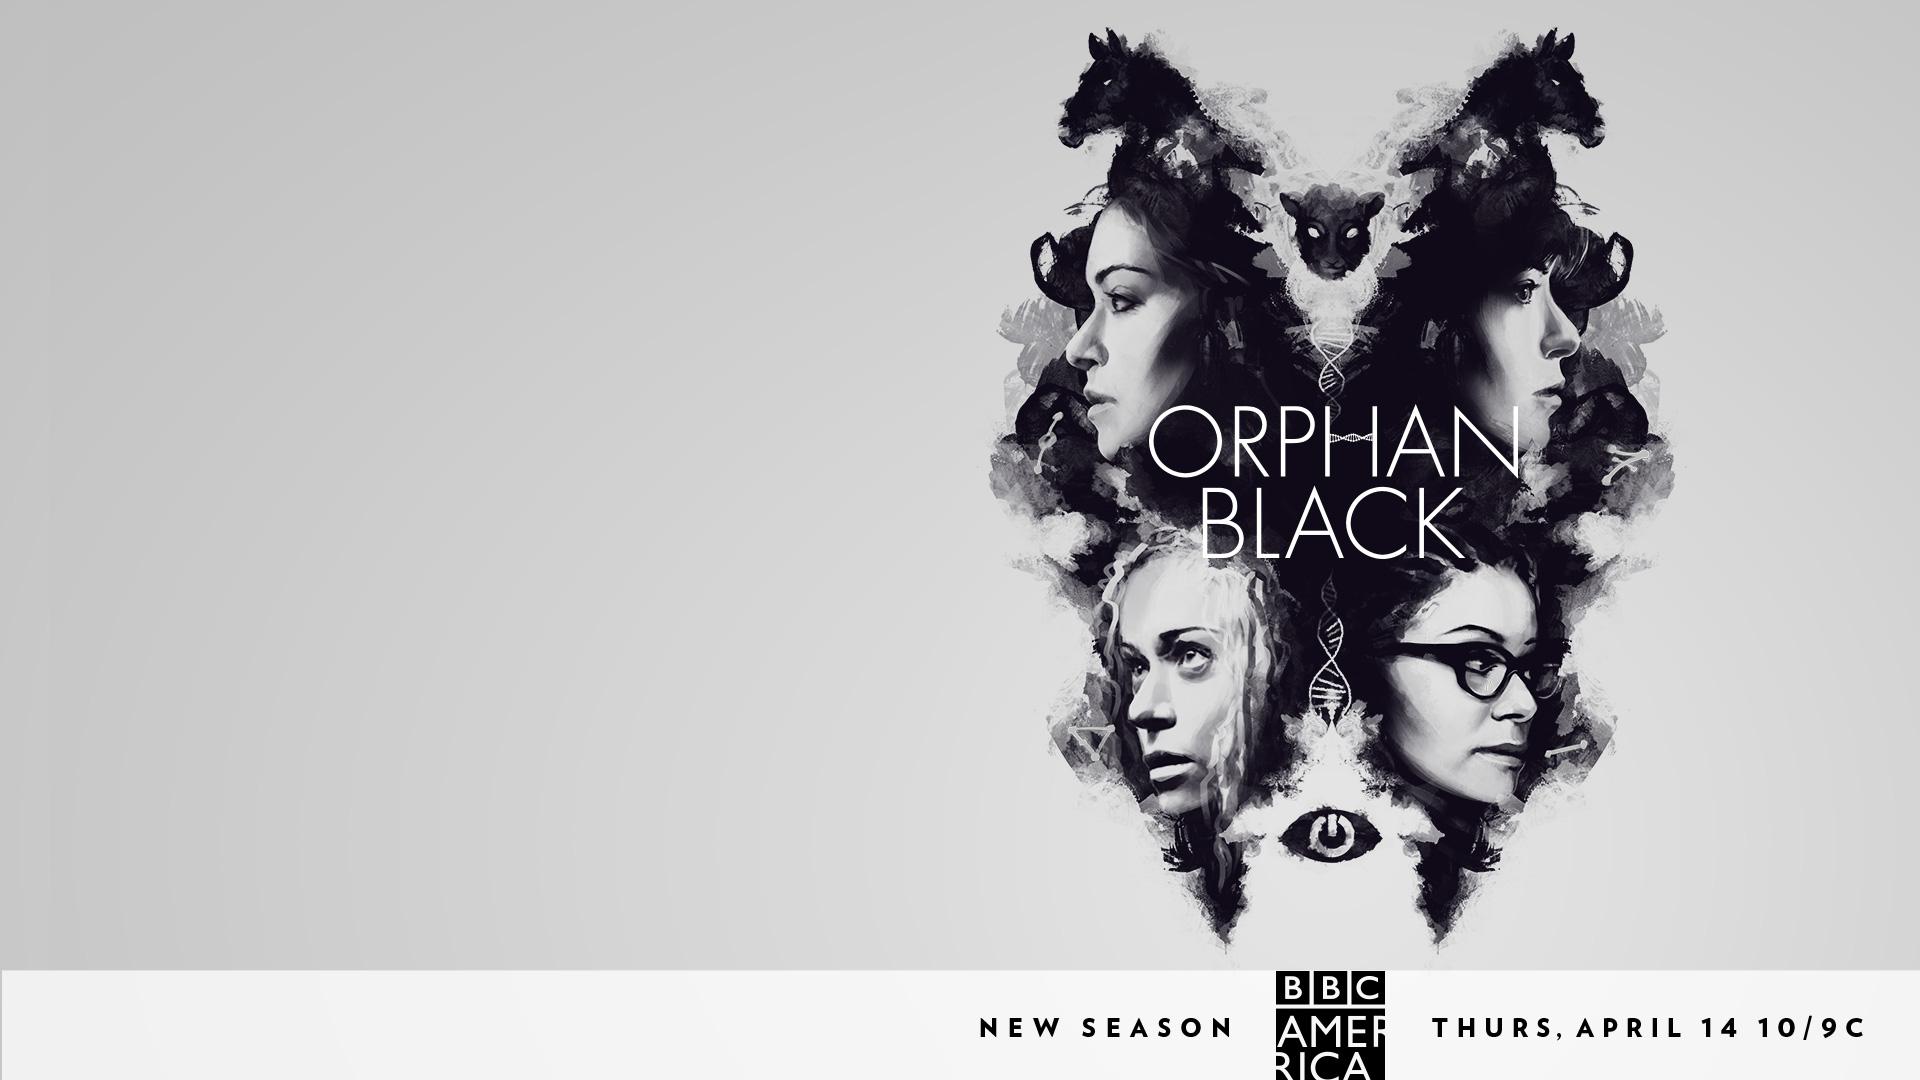 Orphan Black Fan Art Poster Contest Top 20 Finalists